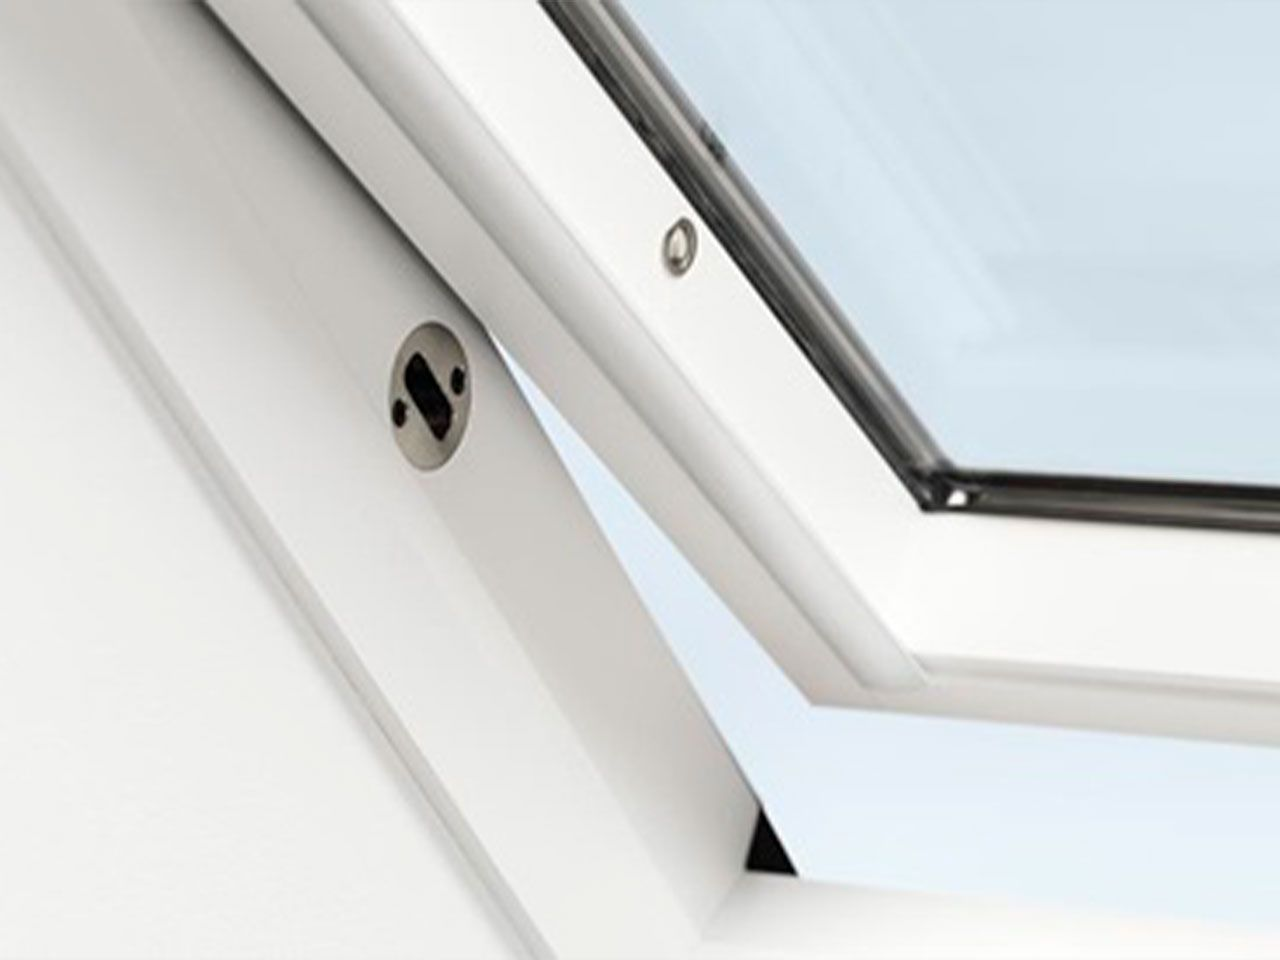 ventana de tejado anti intrusion